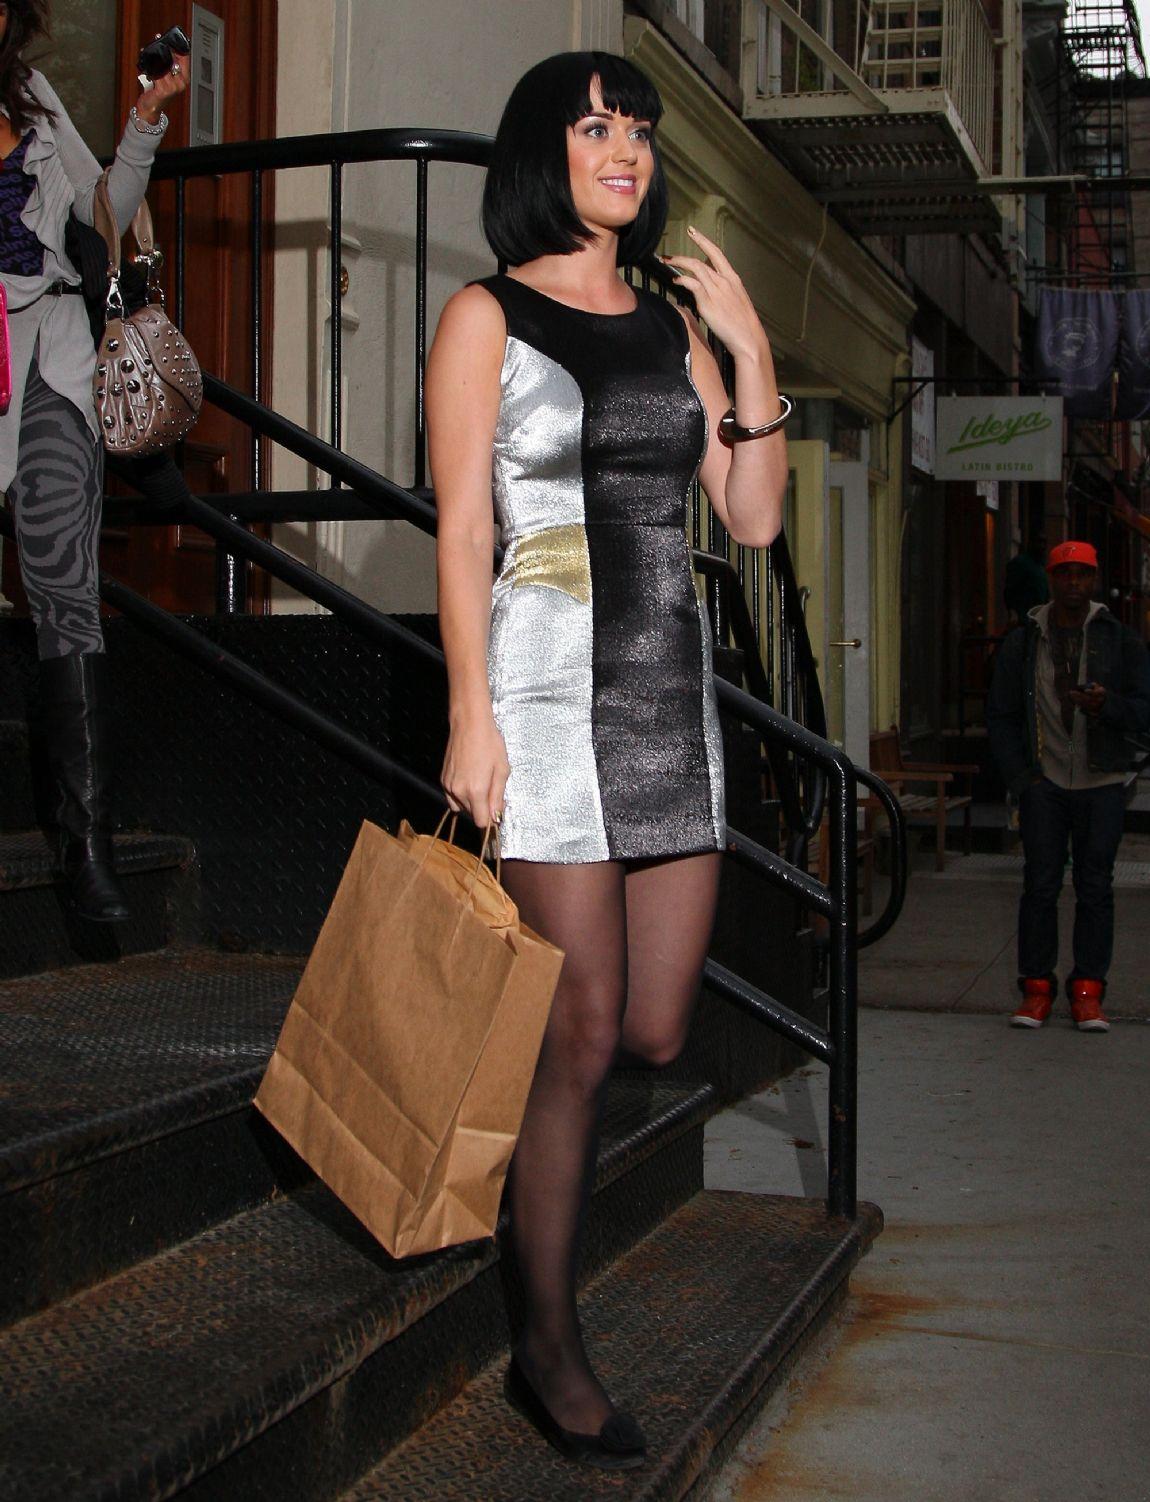 http://3.bp.blogspot.com/_VvCaQlz5Gvs/TLBQL1gZE1I/AAAAAAAAB48/yYQMisj2qxc/s1600/katy+perry+sexy+legs+01.jpg